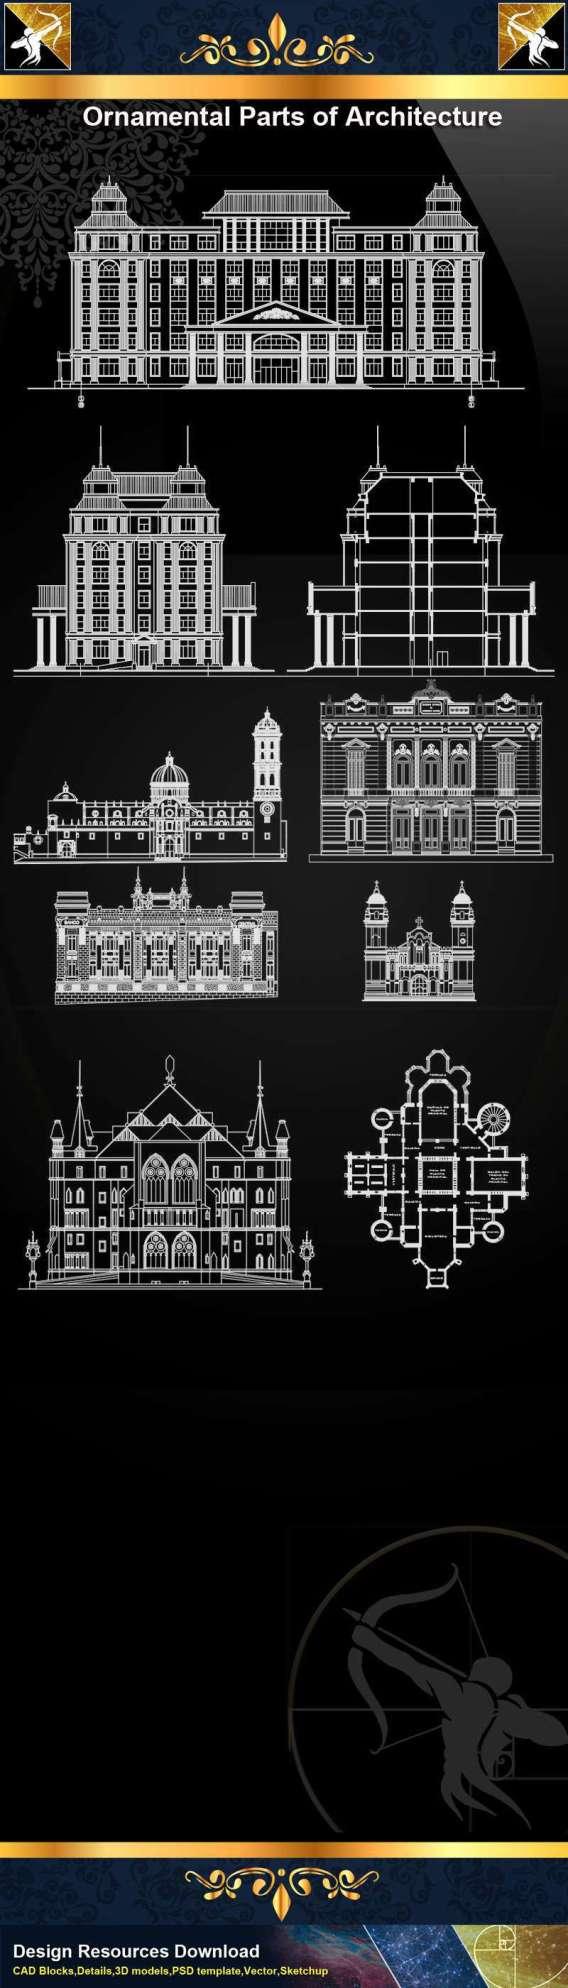 ★【Ornamental Parts of Architecture -Decoration Element CAD Blocks V.4】@Autocad Decoration Blocks,Drawings,CAD Details,Elevation